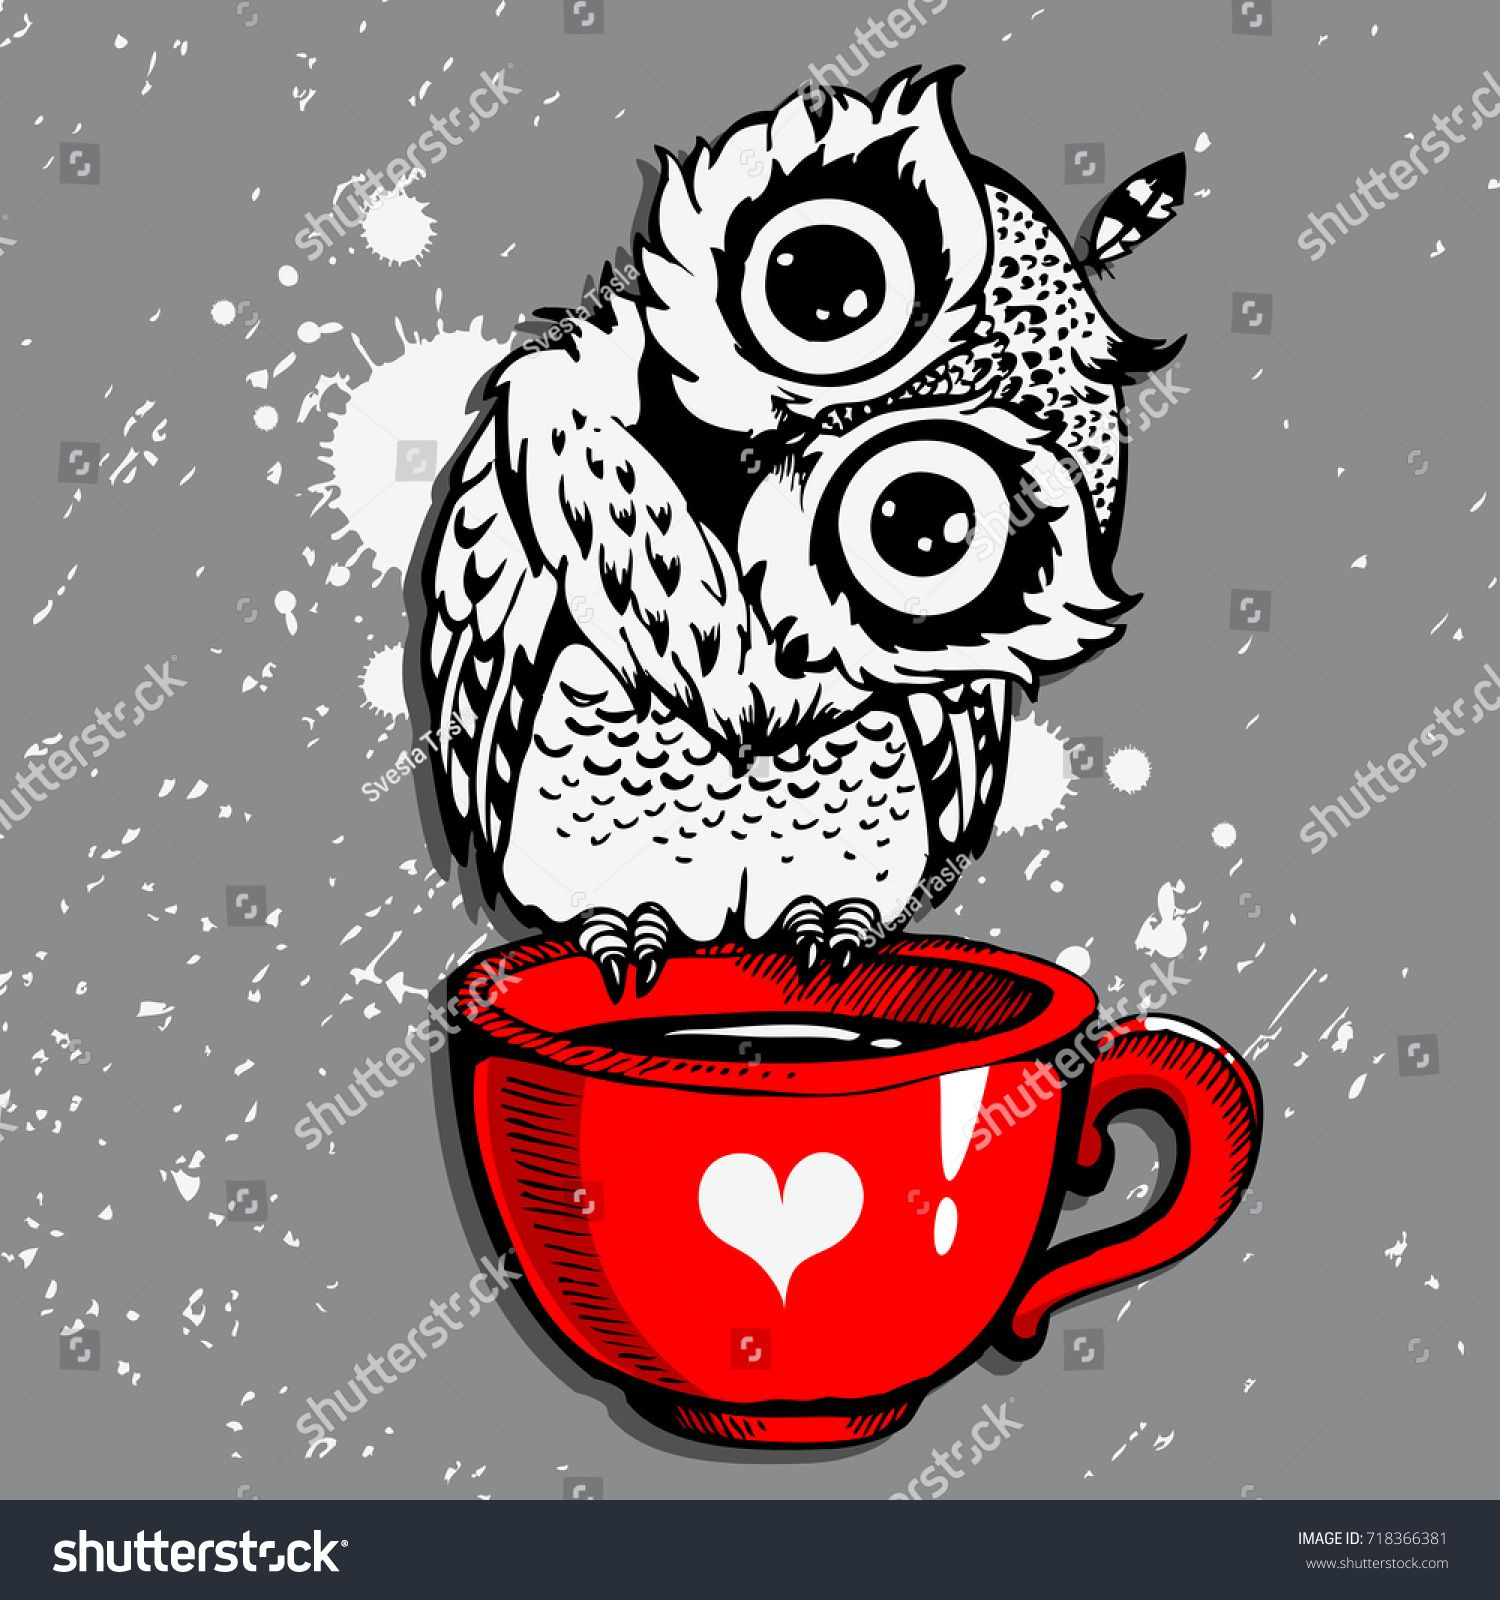 5644537e0 Cute Owl/Vector Owl/cartoon bird/t-shirt design owl/ grunge background with  bird / owl hipster print/owl character/Owl with coffee/hand drawn owl